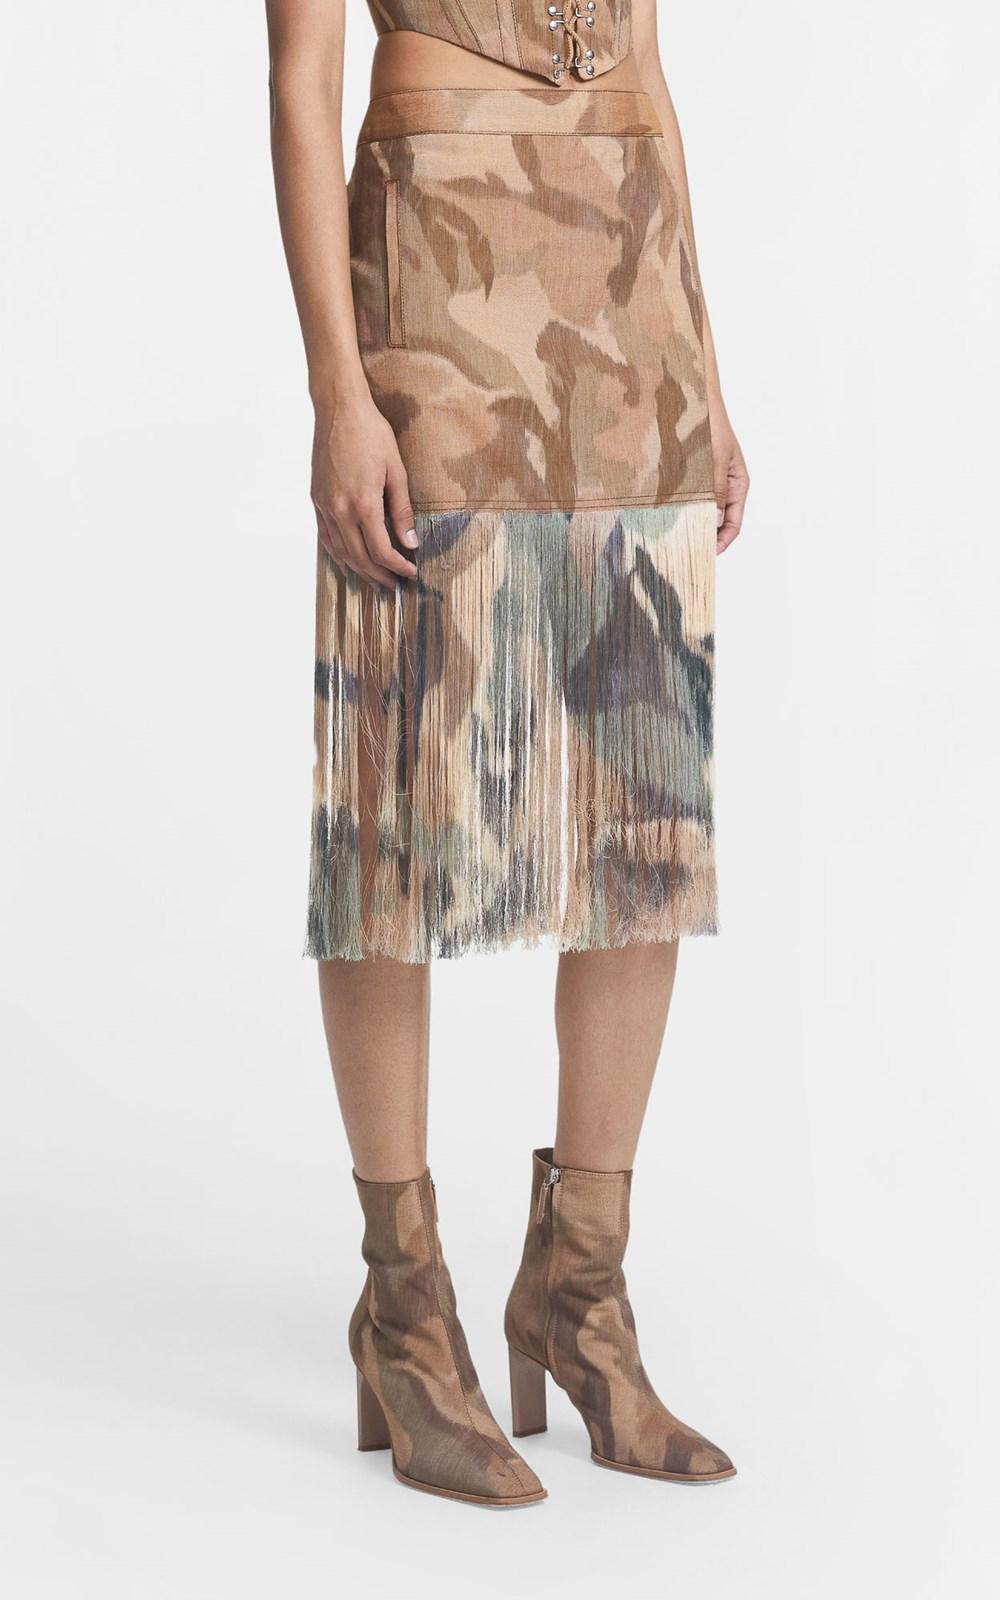 Skirts | IKAT CAMO FRINGE SKIRT